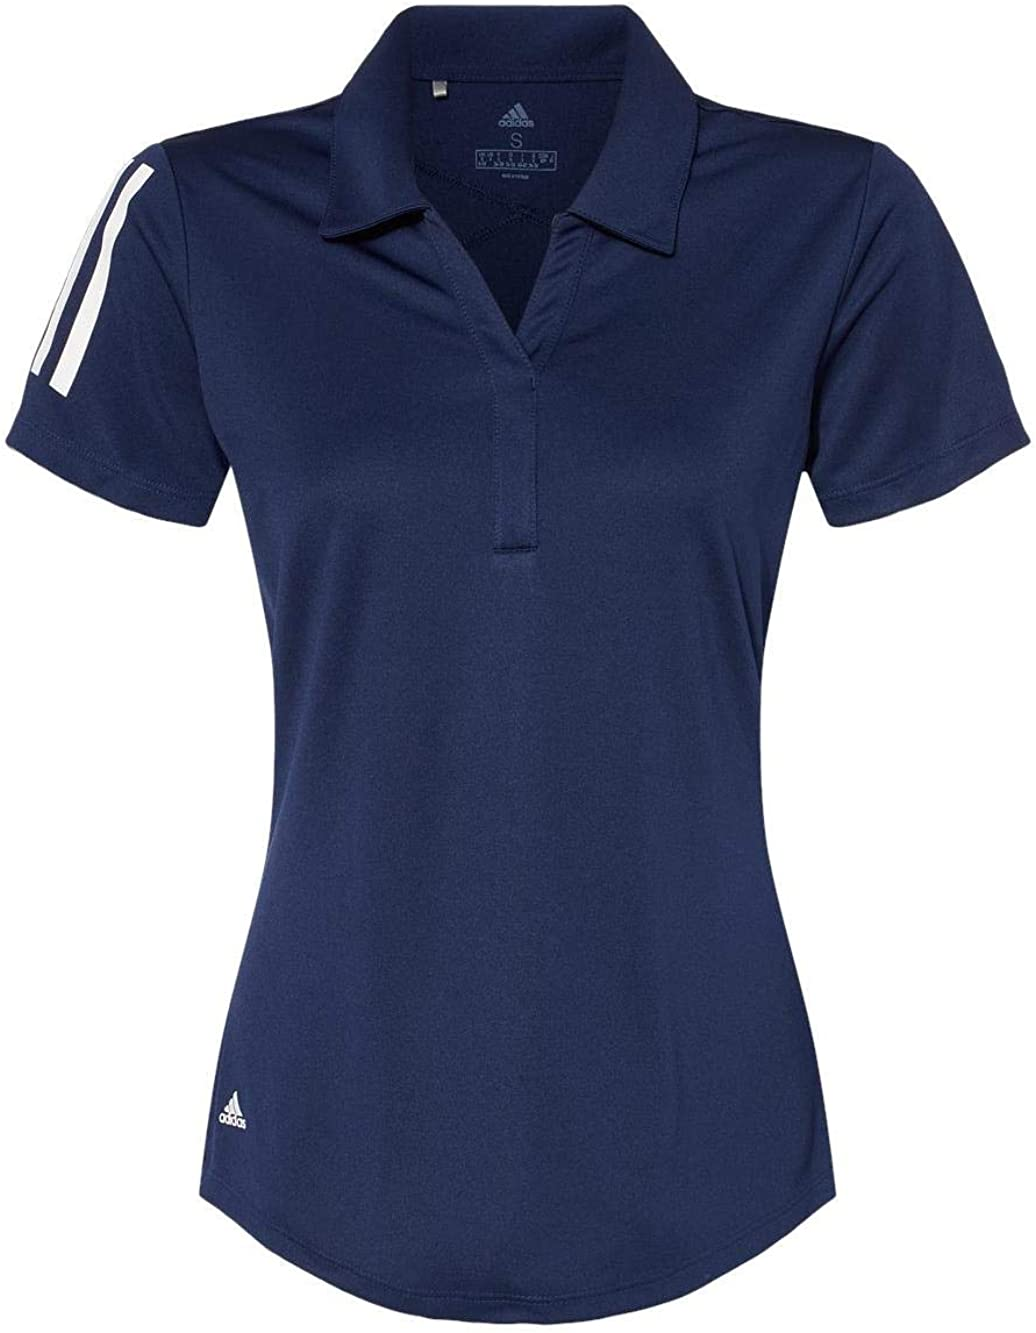 adidas - Women's Floating 3-Stripes Sport Shirt - A481 - S - Team Navy Blue/White